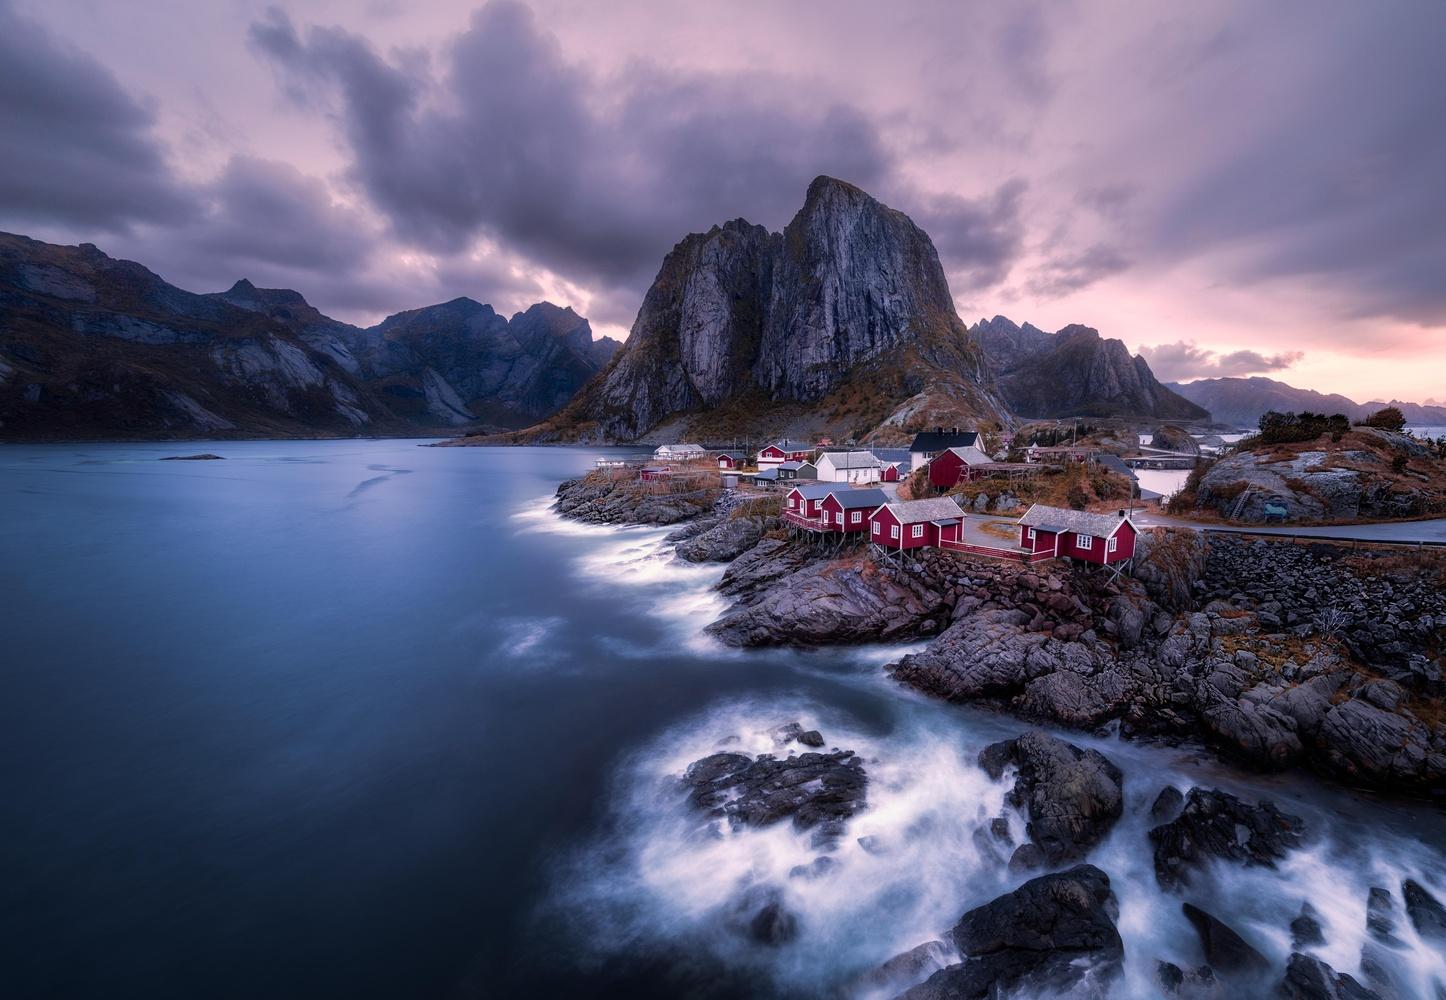 Hamnøy by Richard Beresford Harris